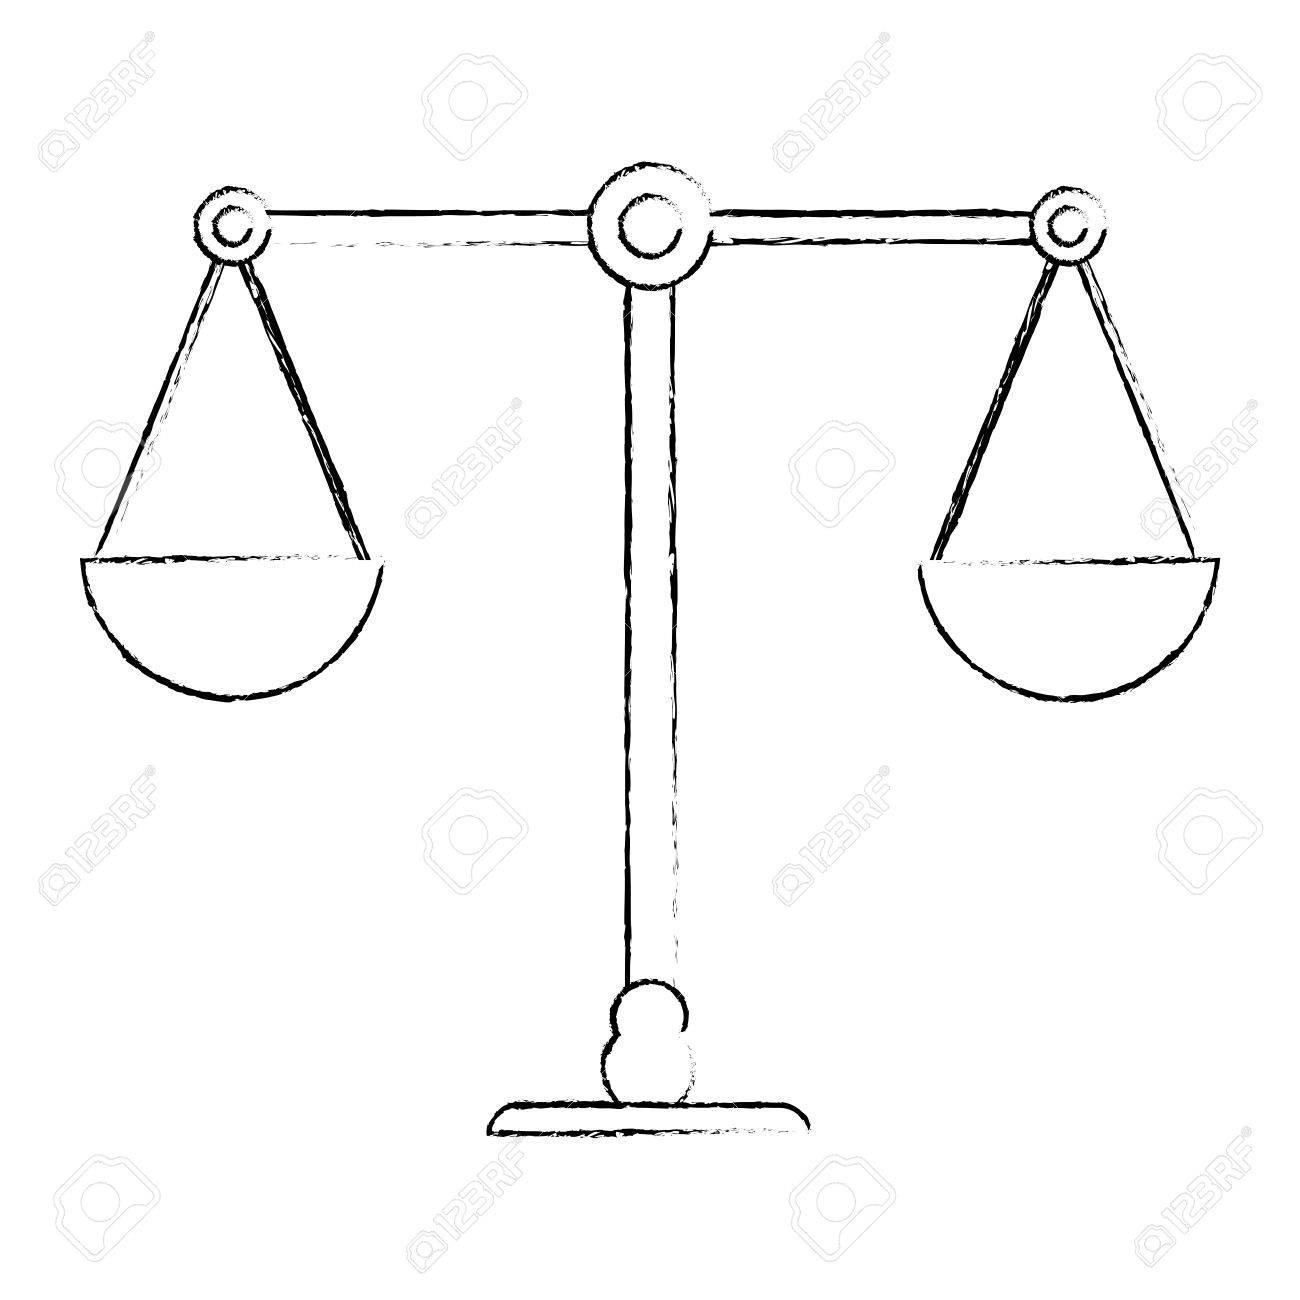 1300x1300 Balance Justice Equality Image Sketch Vector Illustration Eps